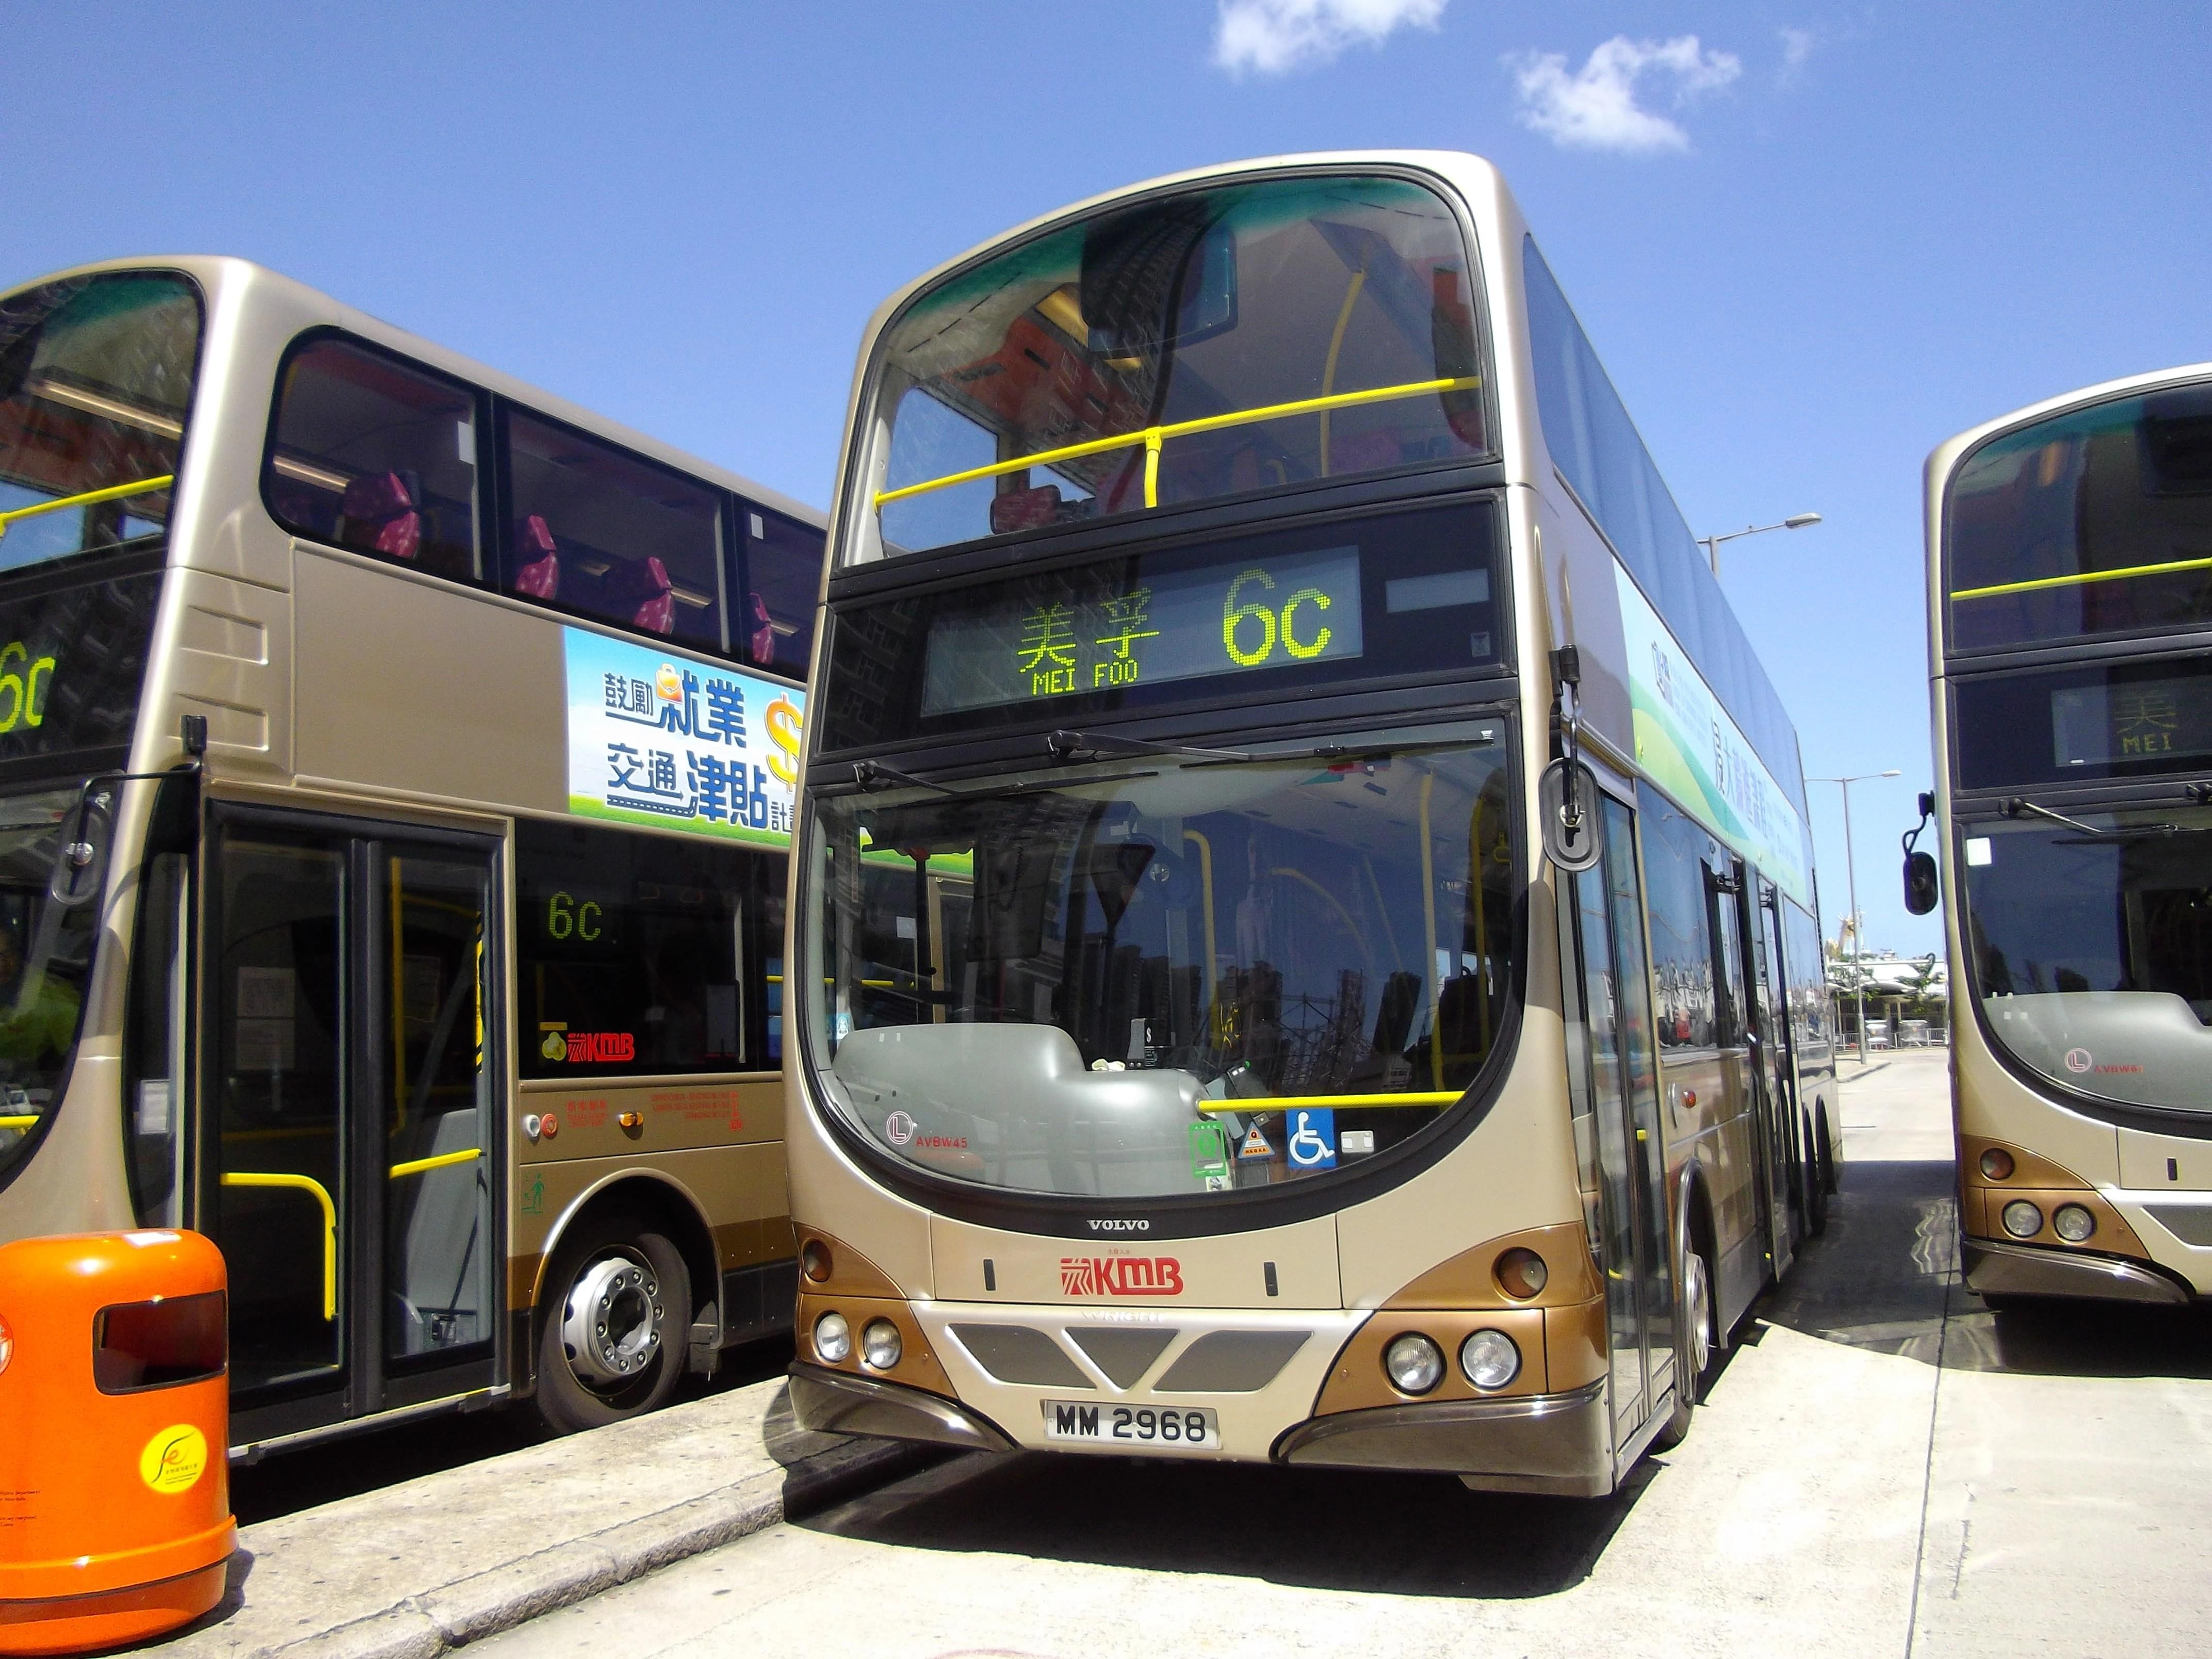 Image - AVBW45 6C.jpg - 香港巴士大典